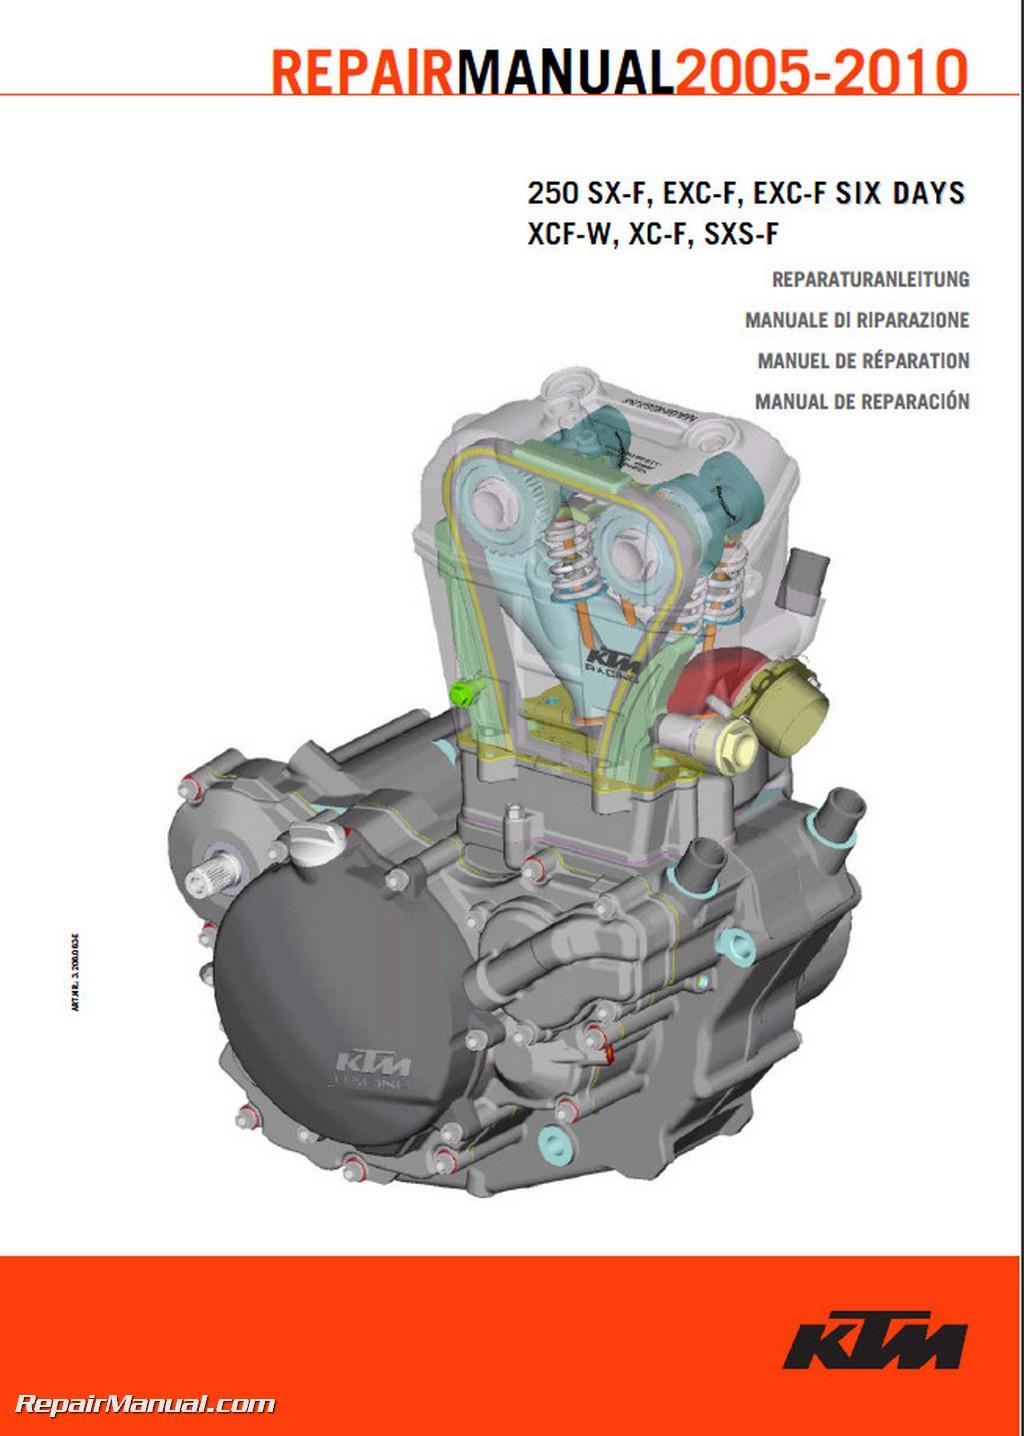 Diesel Mechanic review my paper free